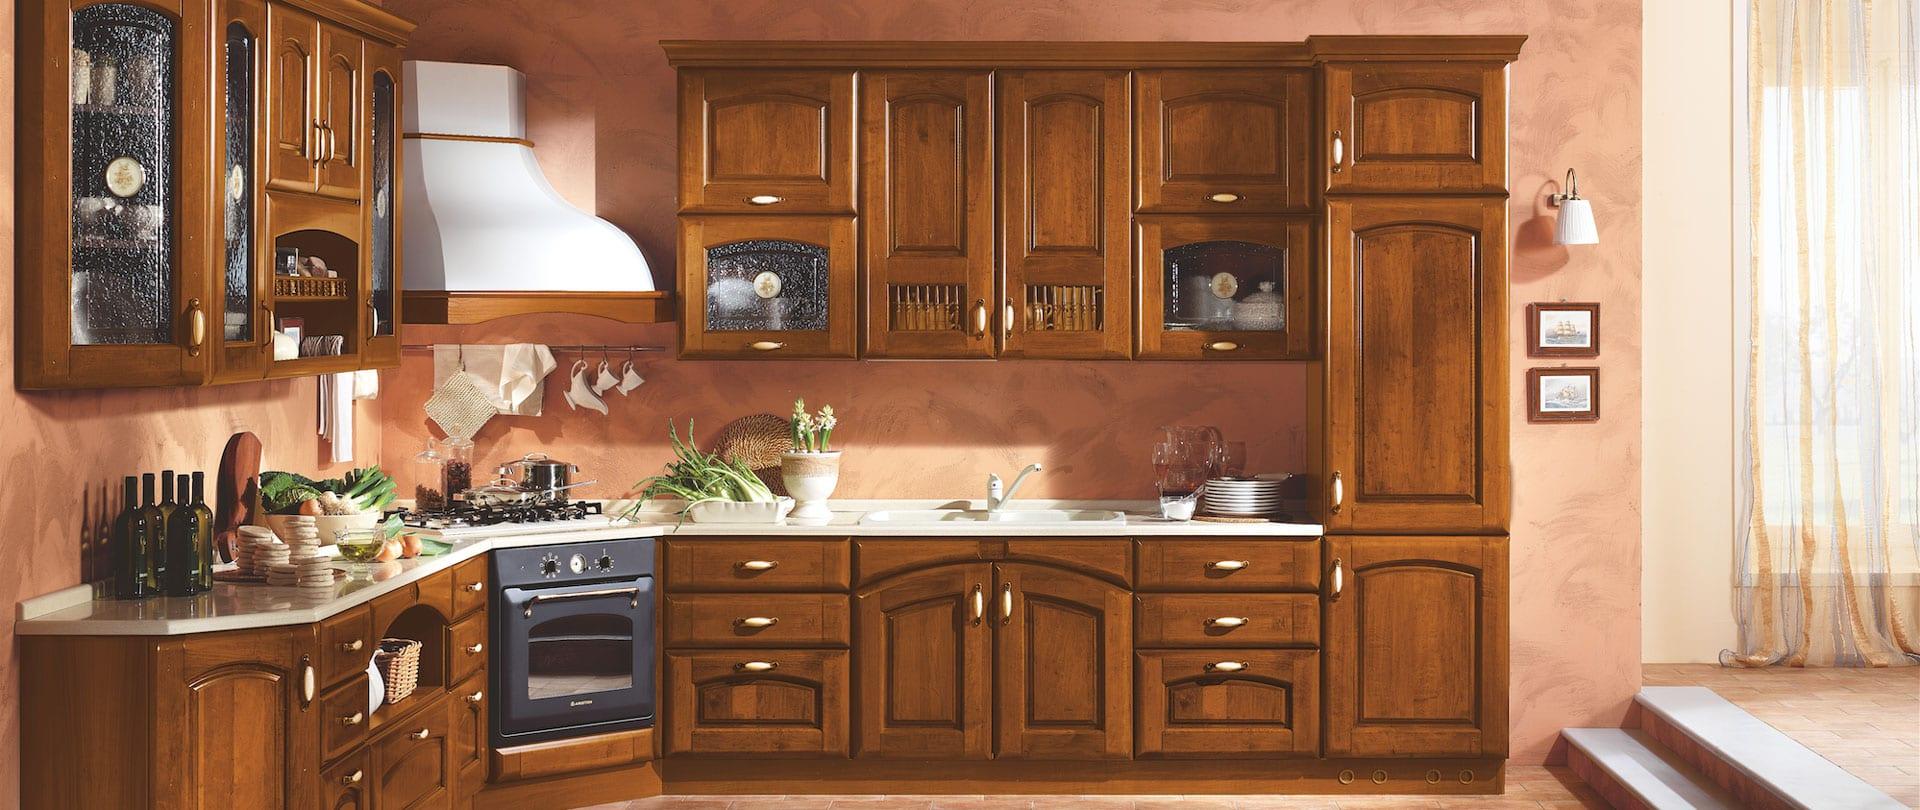 Cucina in noce, un design classico, cucine in stile classico